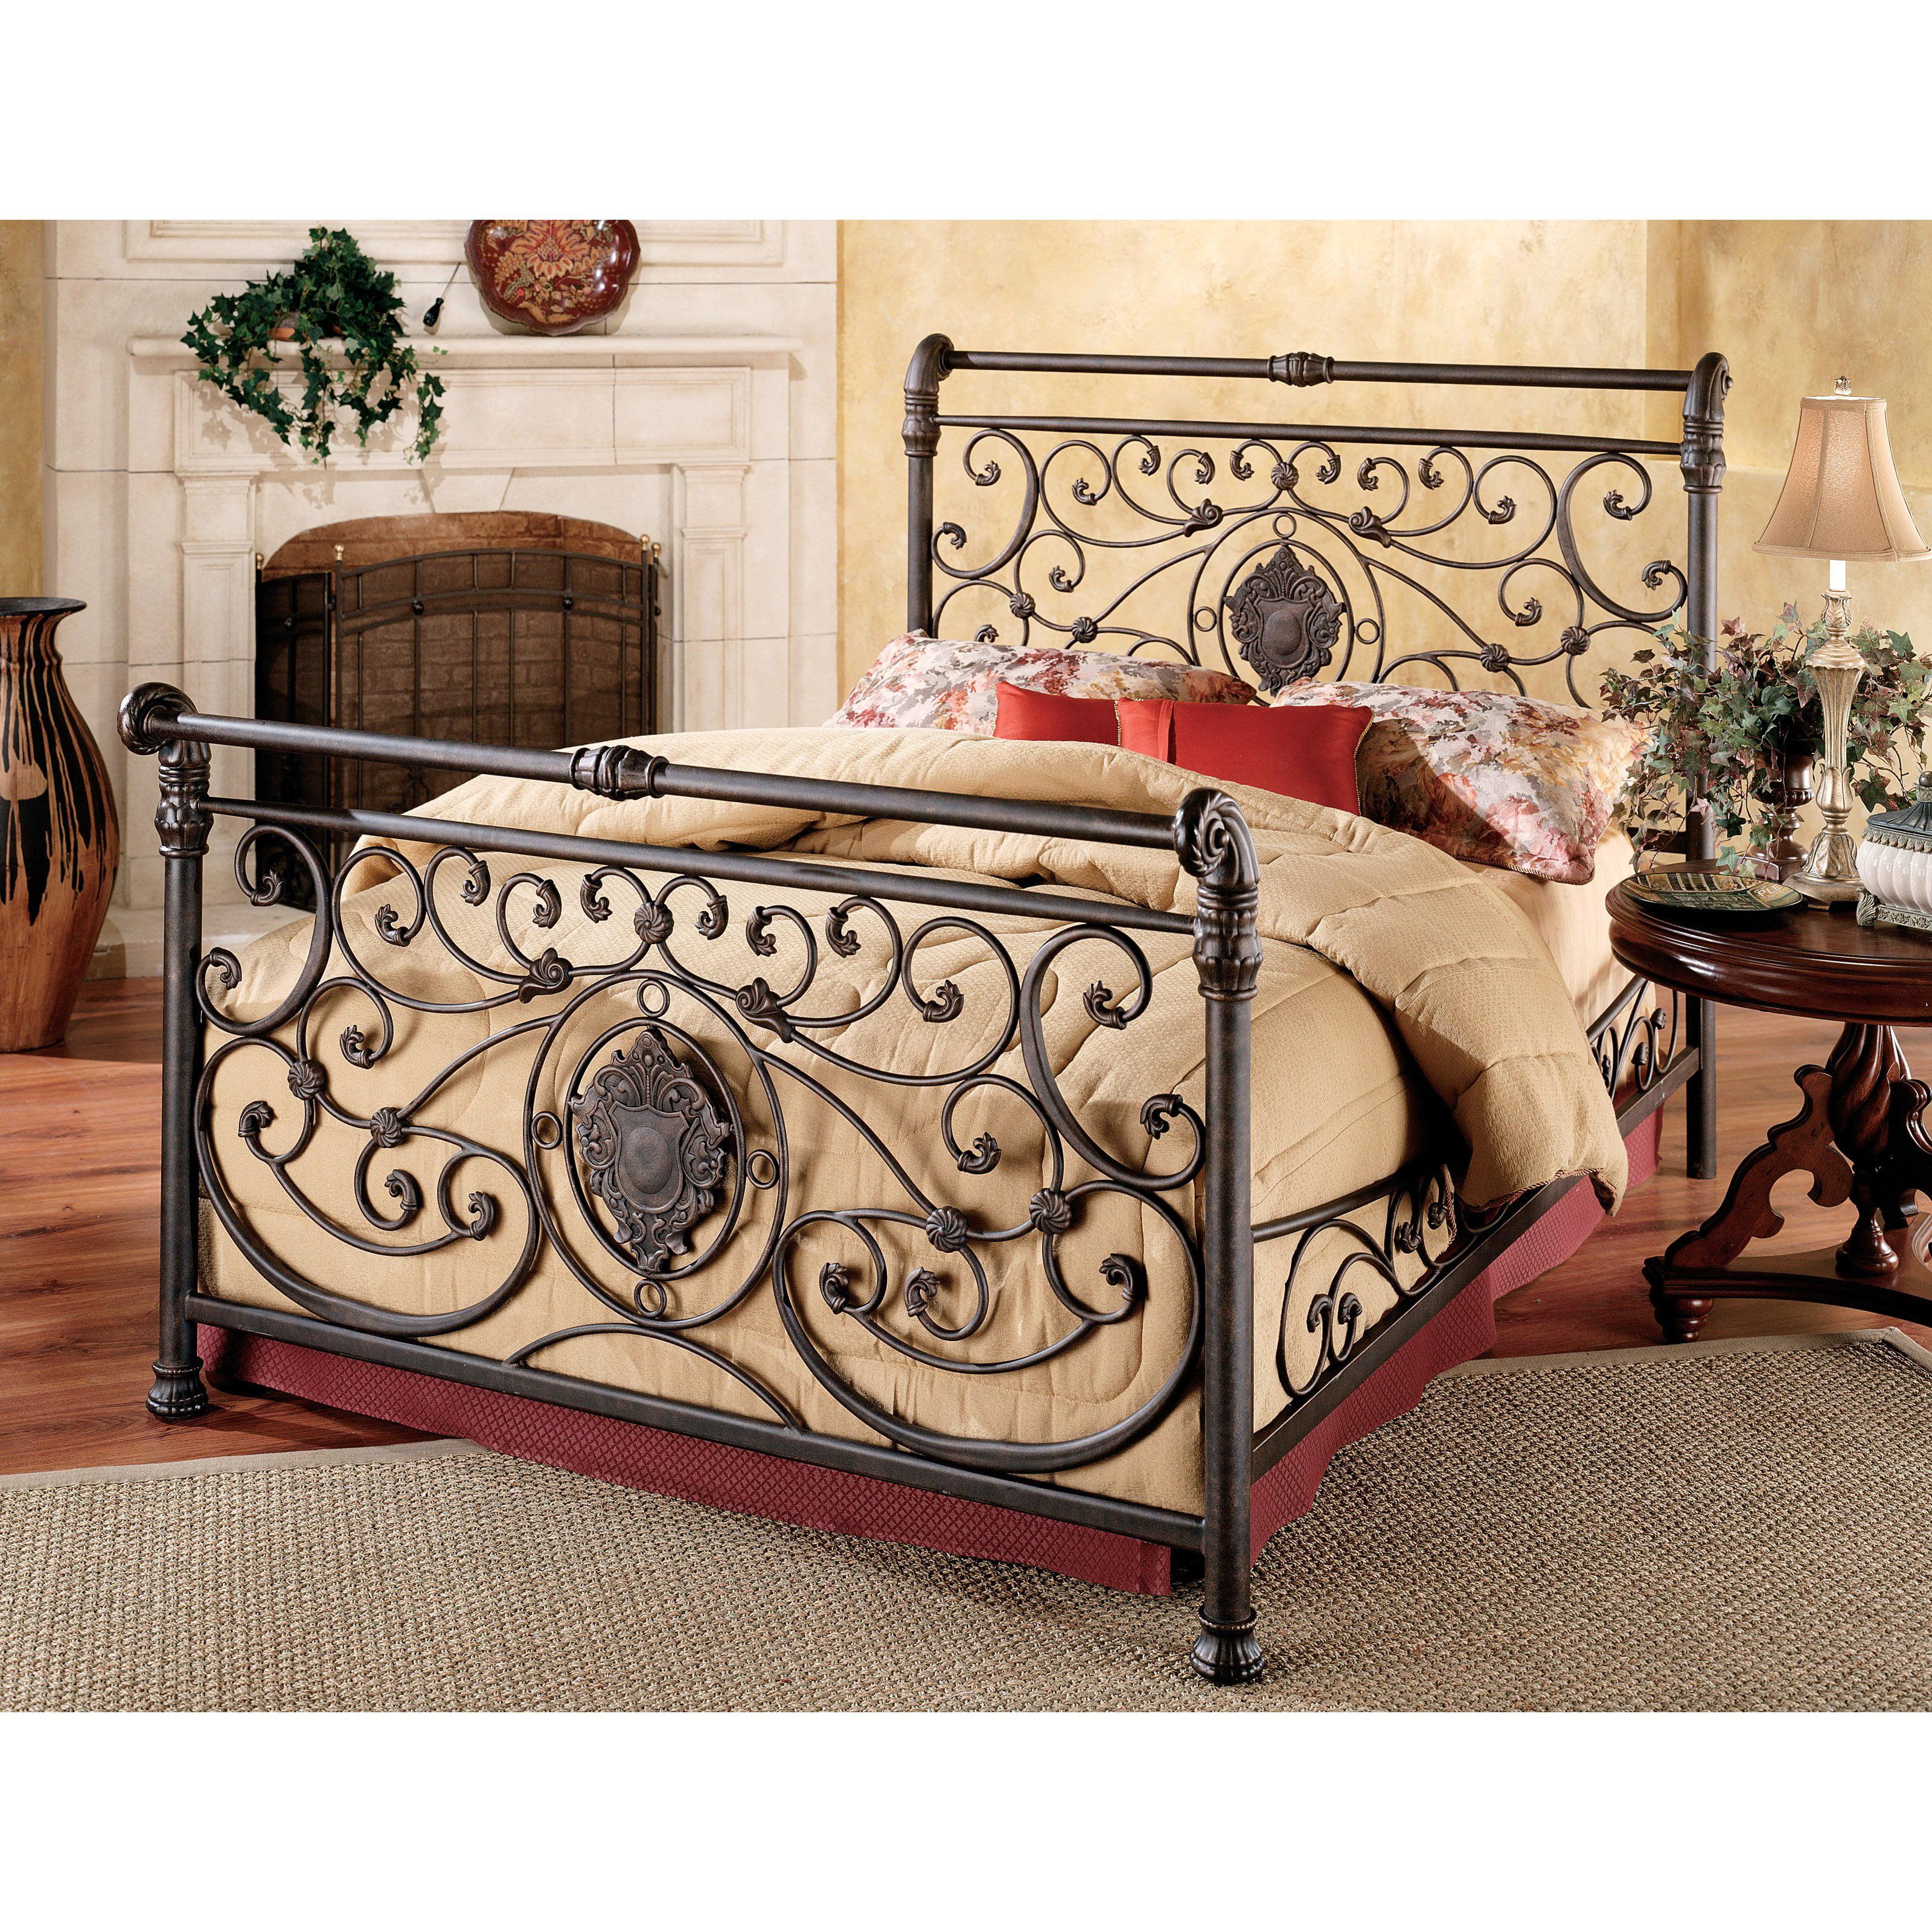 Hillsdale Mercer Sleigh Bed by Hillsdale Furniture LLC